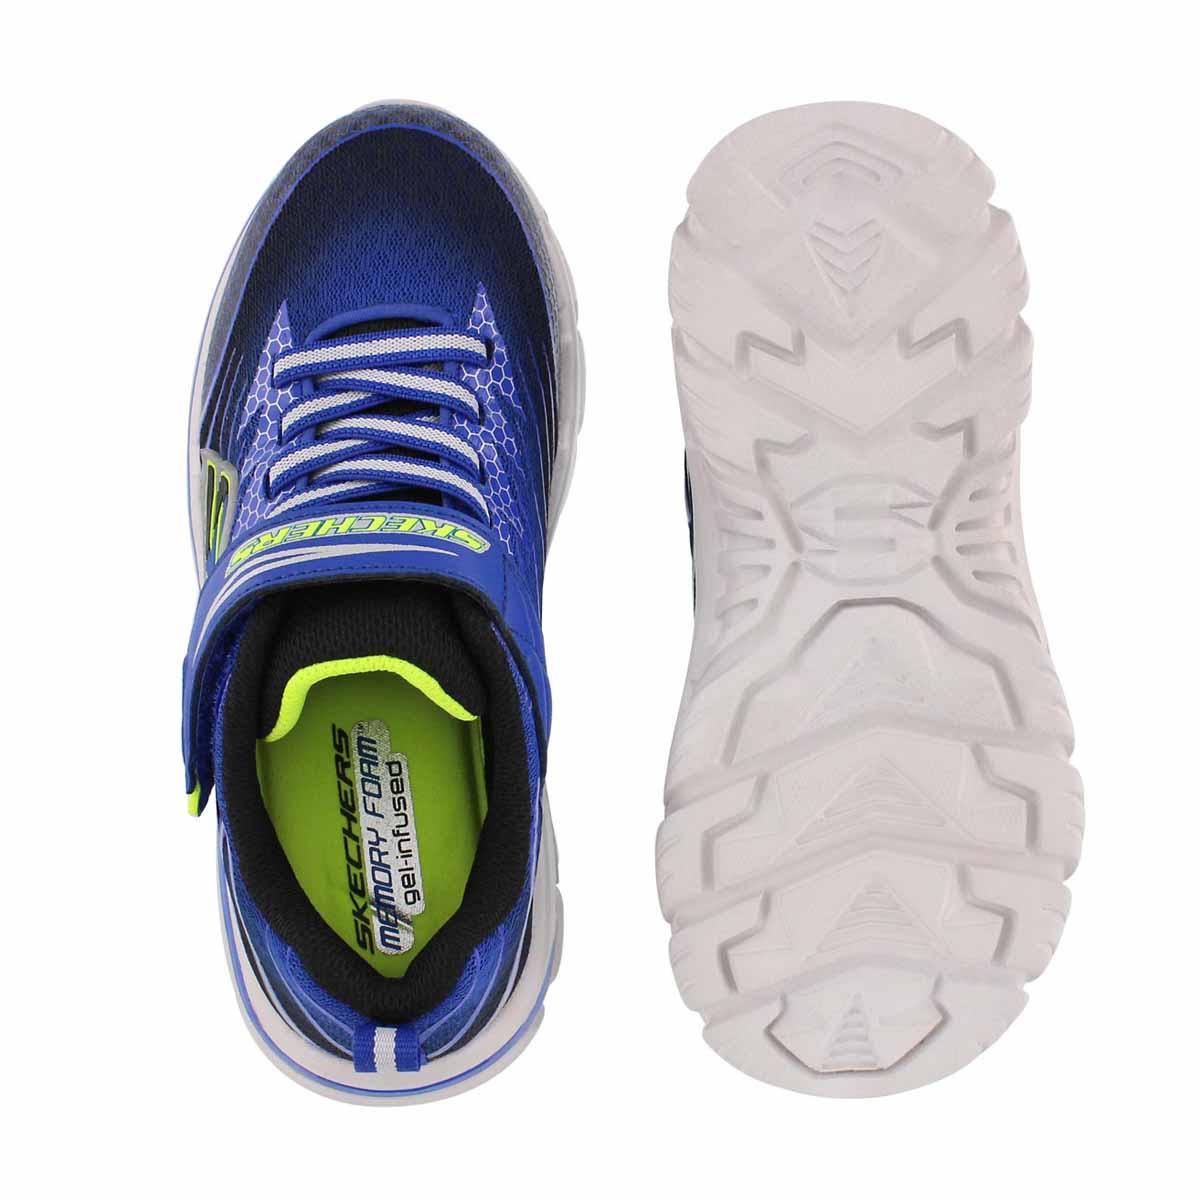 Bys Nitrate Pulsar blue/black sneaker